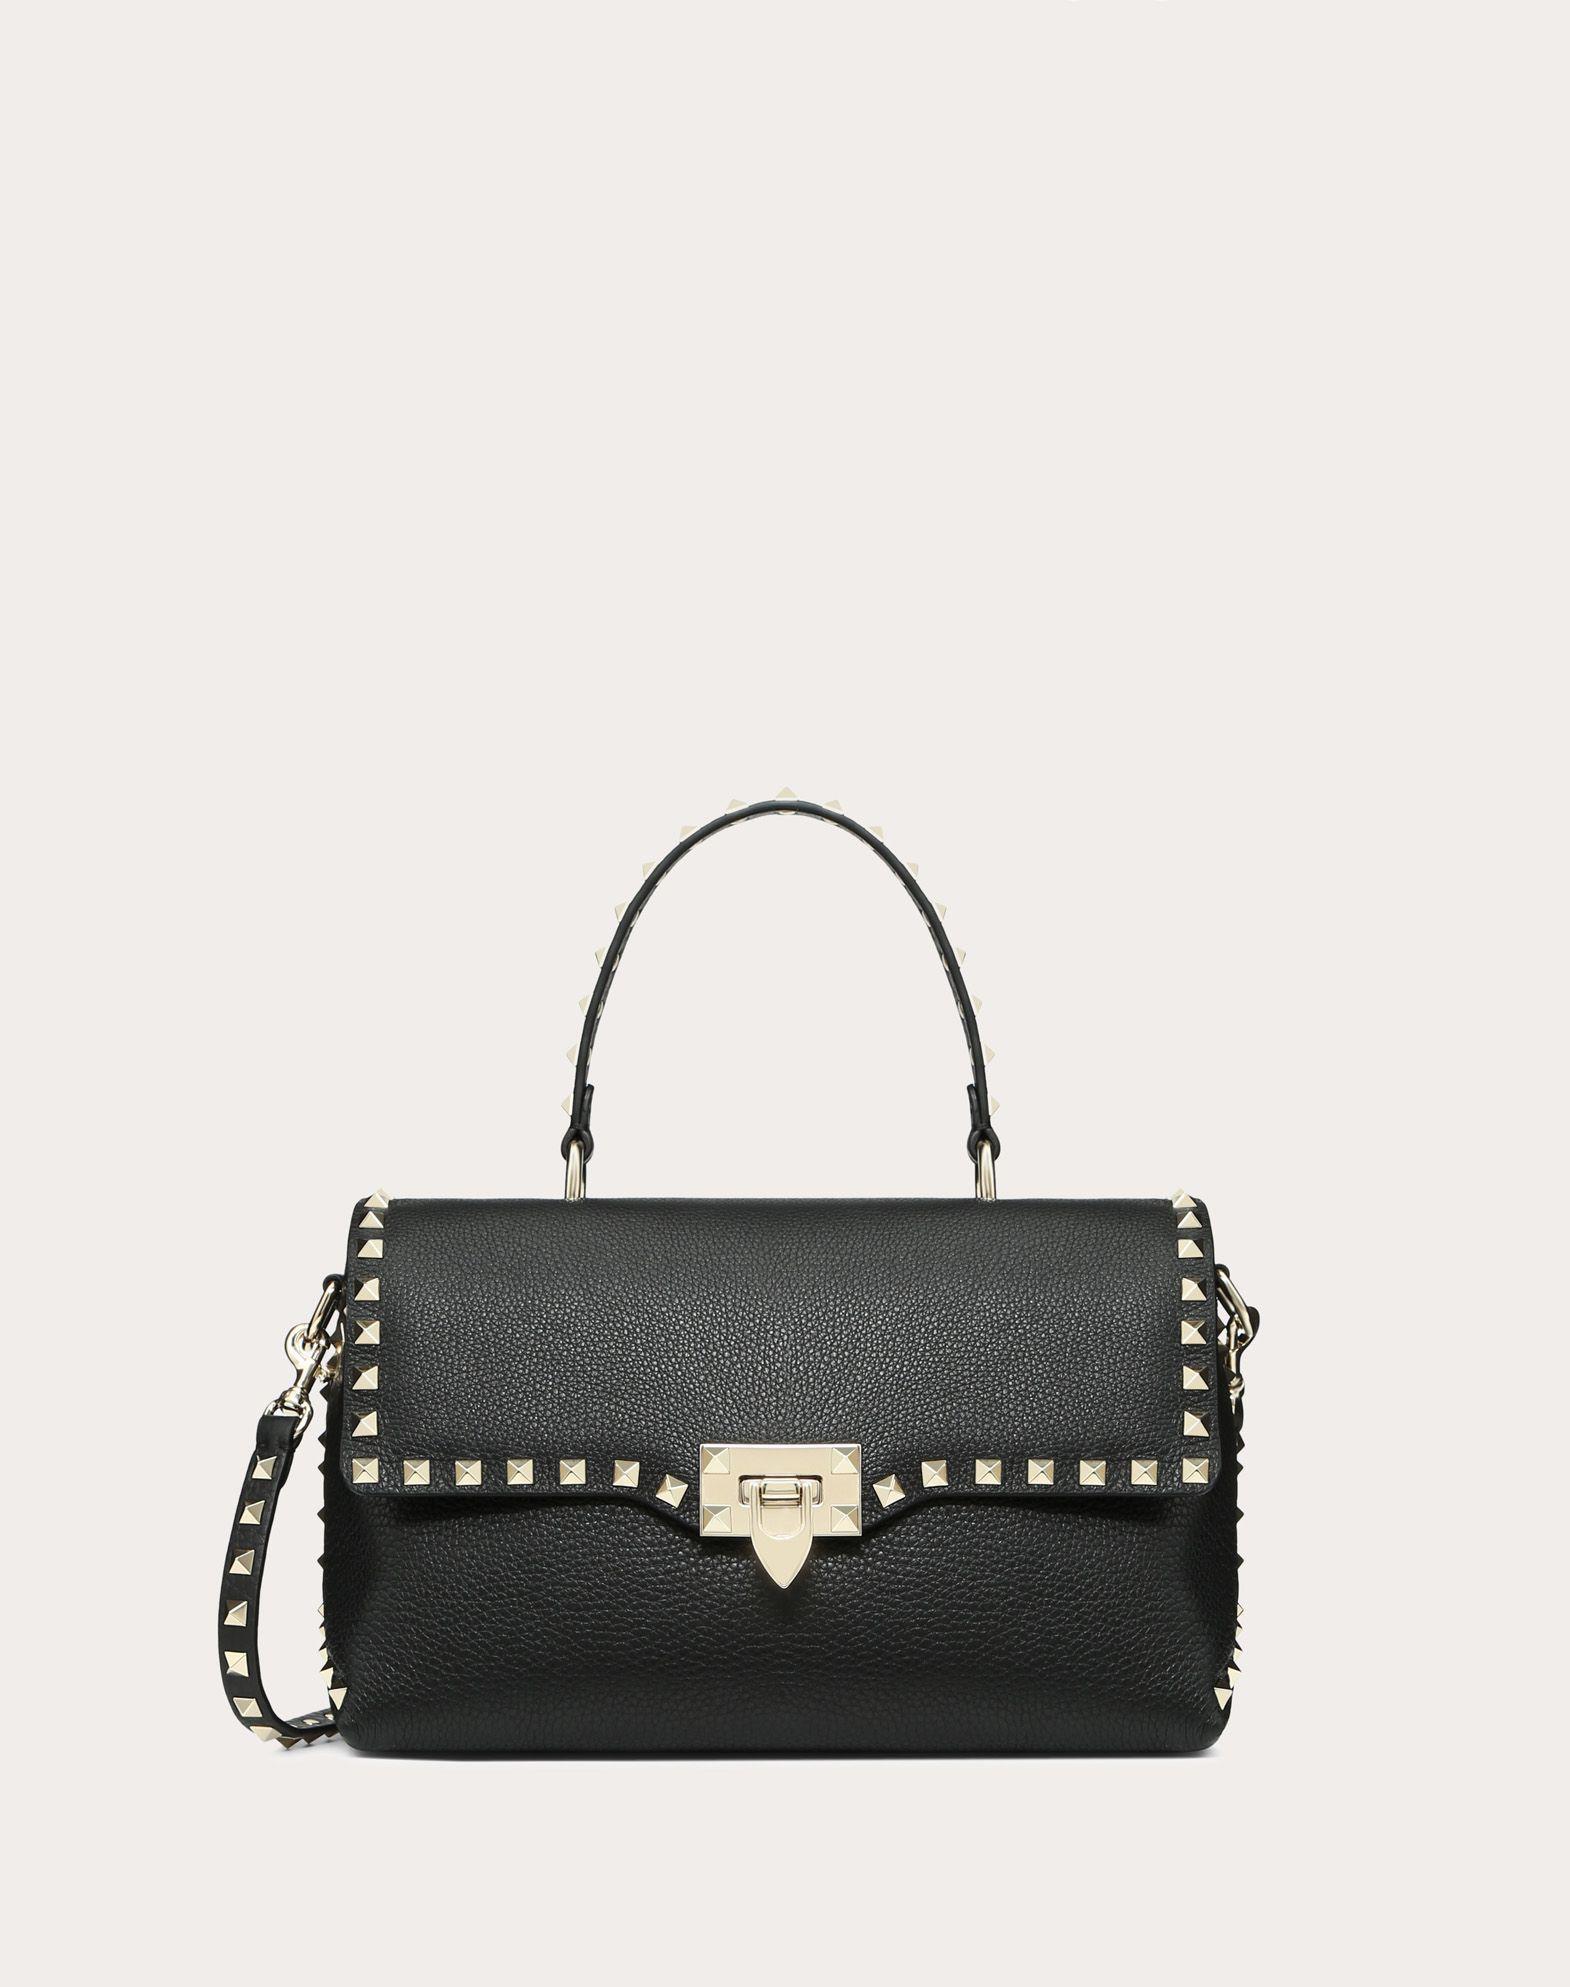 Mittelgroße Handtasche Rockstud aus genarbtem Kalbsleder